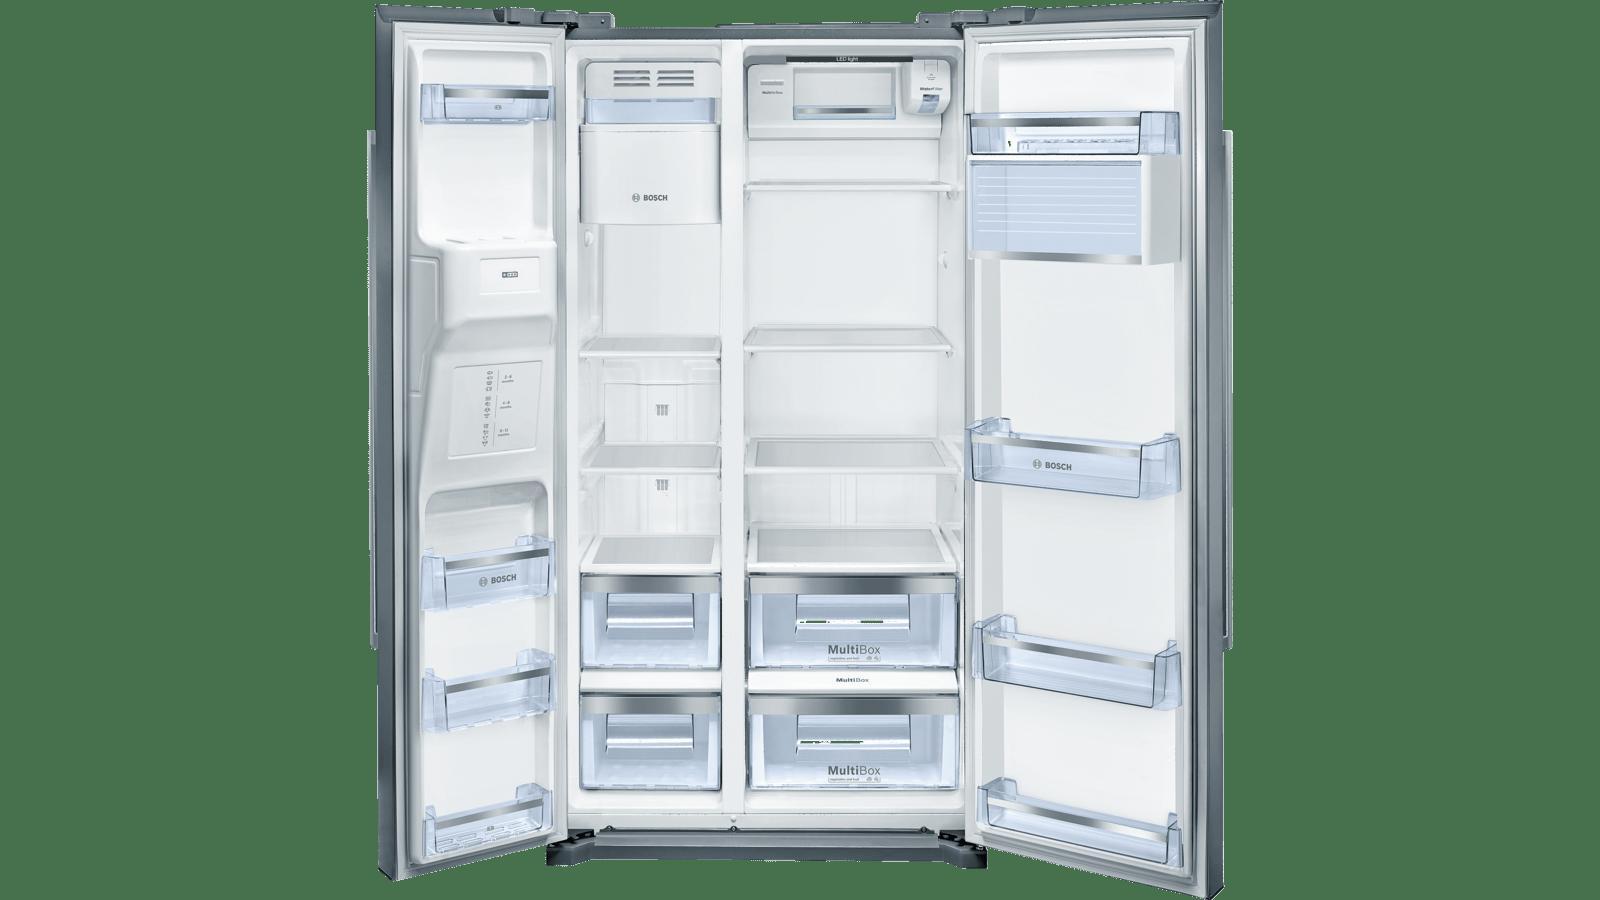 Refrigerateur Americain Faible Largeur série 6 sideside américain 177 x 91 cm inox anti trace de doigts  kad90vi30